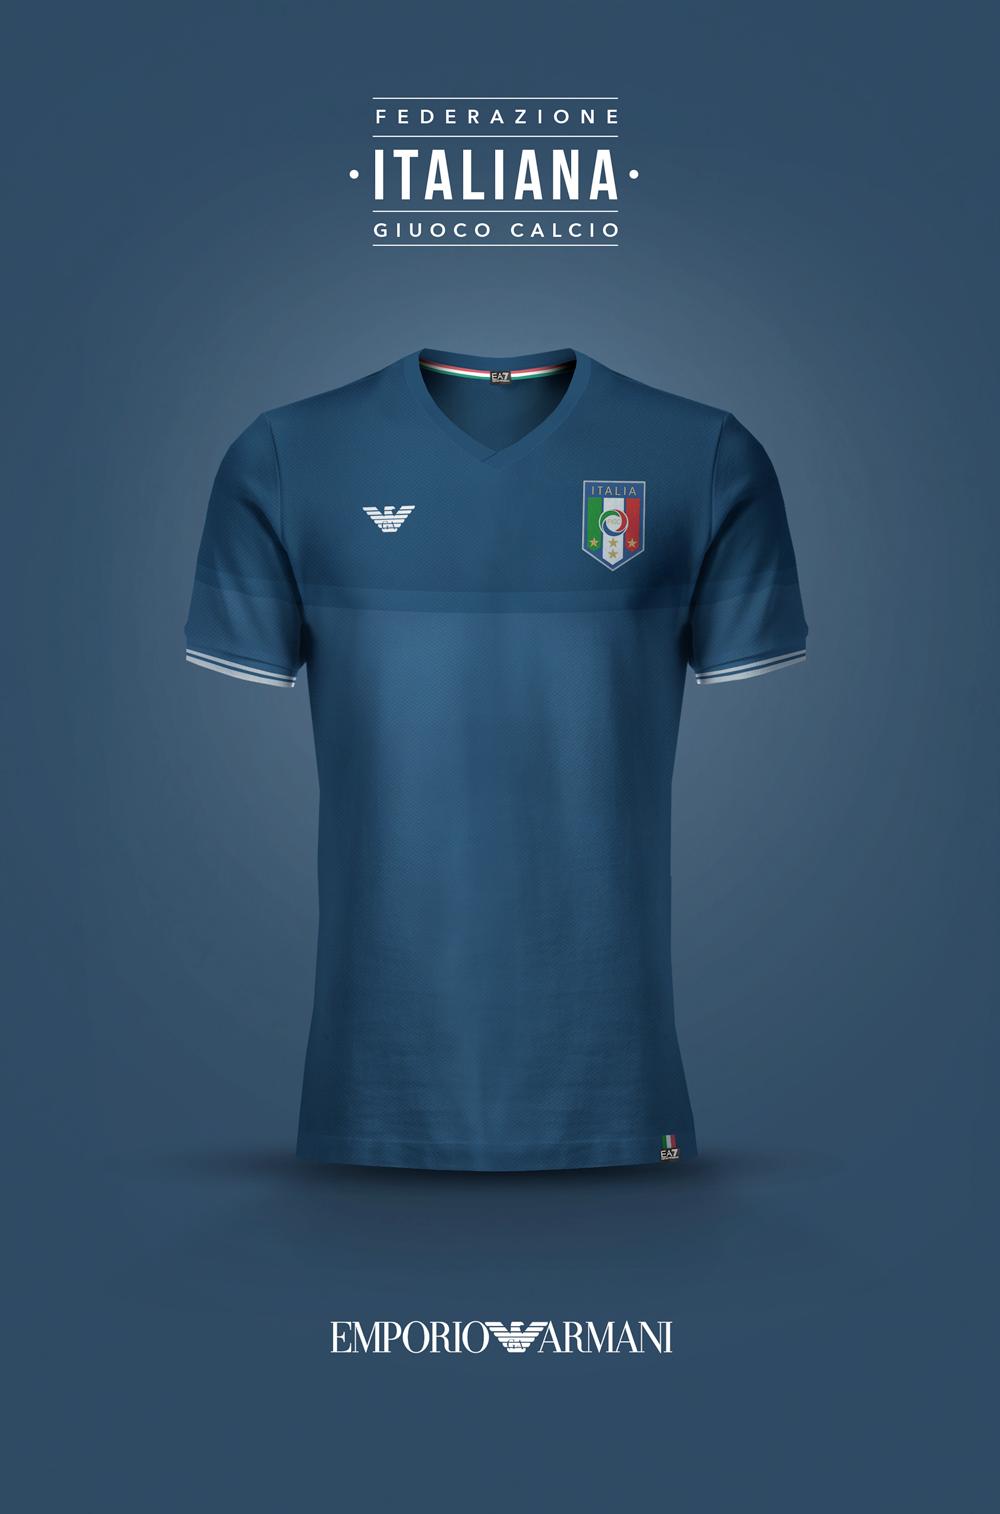 National Football kits reimagined with Local Brand sponsorship by Emilio  Sansolini - Italy x Emporio Armani 52dbb2b25c300